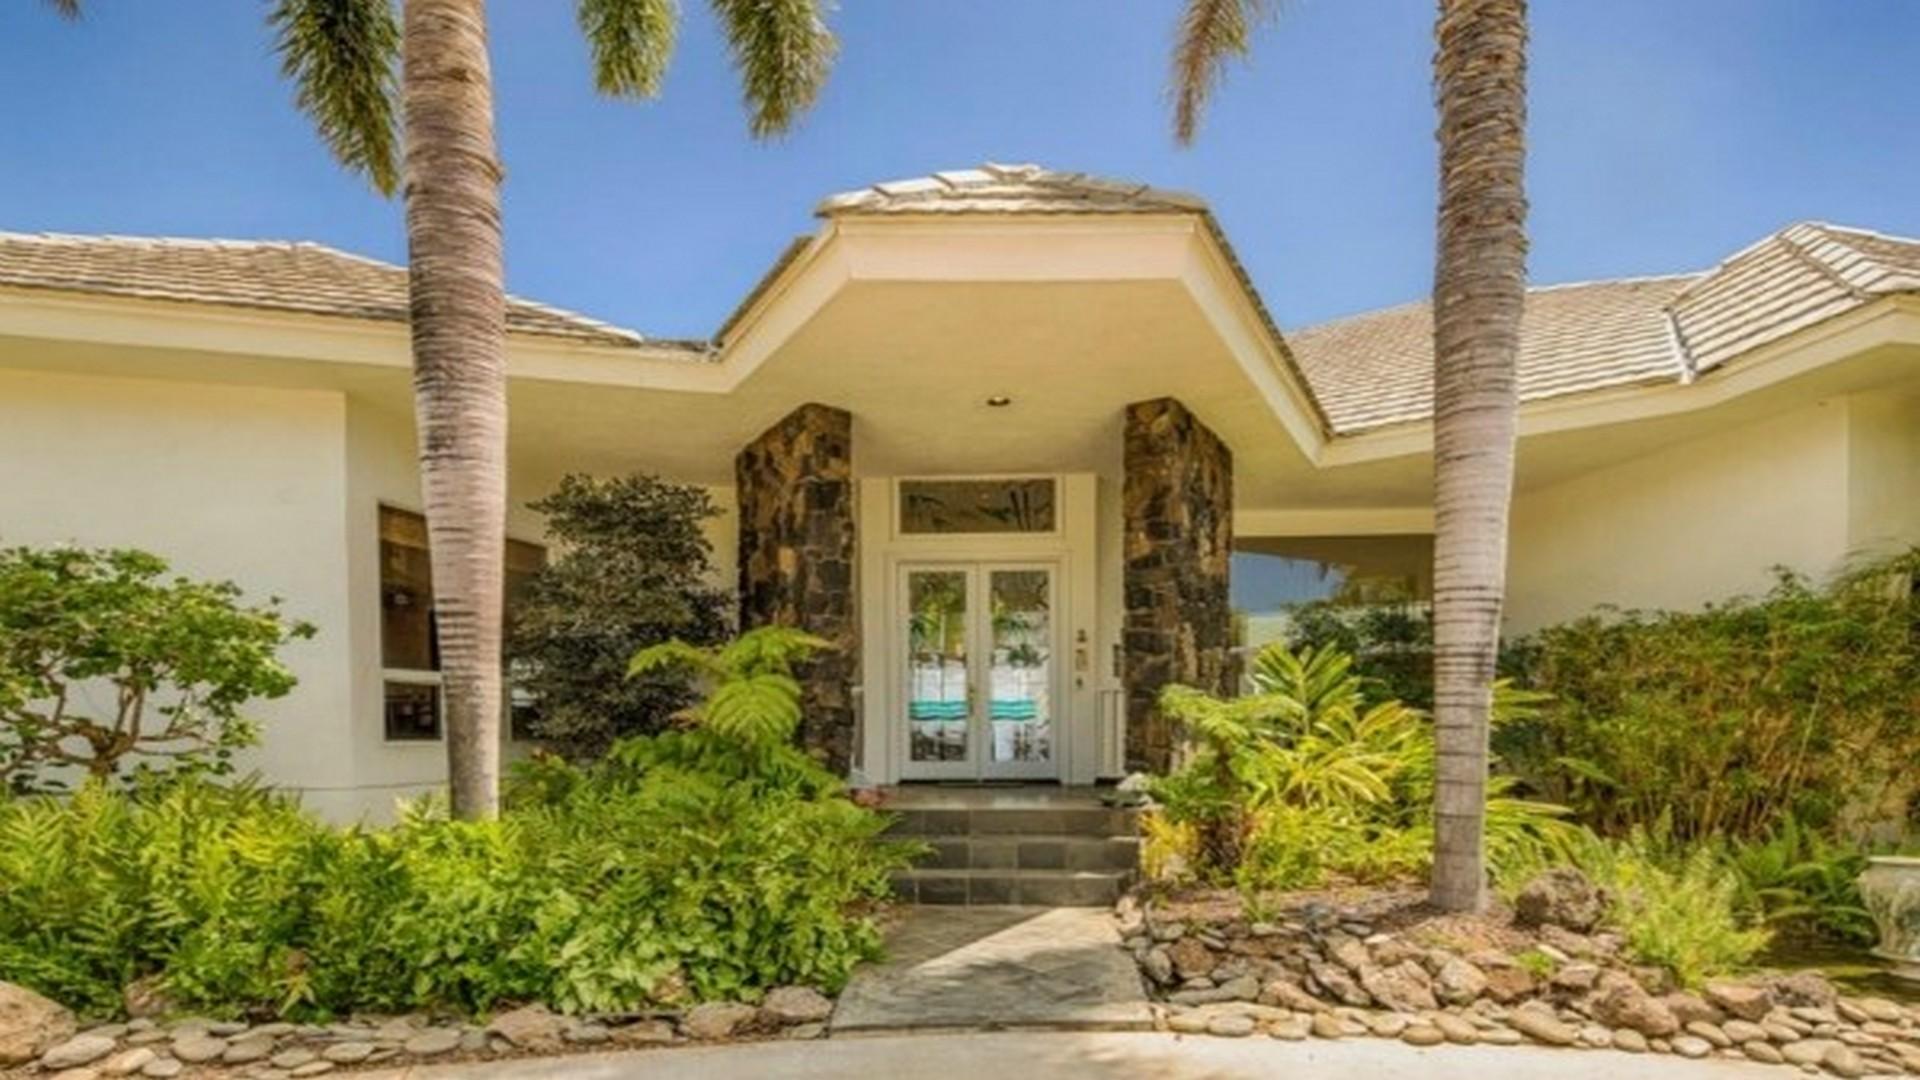 Single Family Home for Sale at Kohala Ranch Pueo Pl Kamuela, Hawaii, 96743 United States